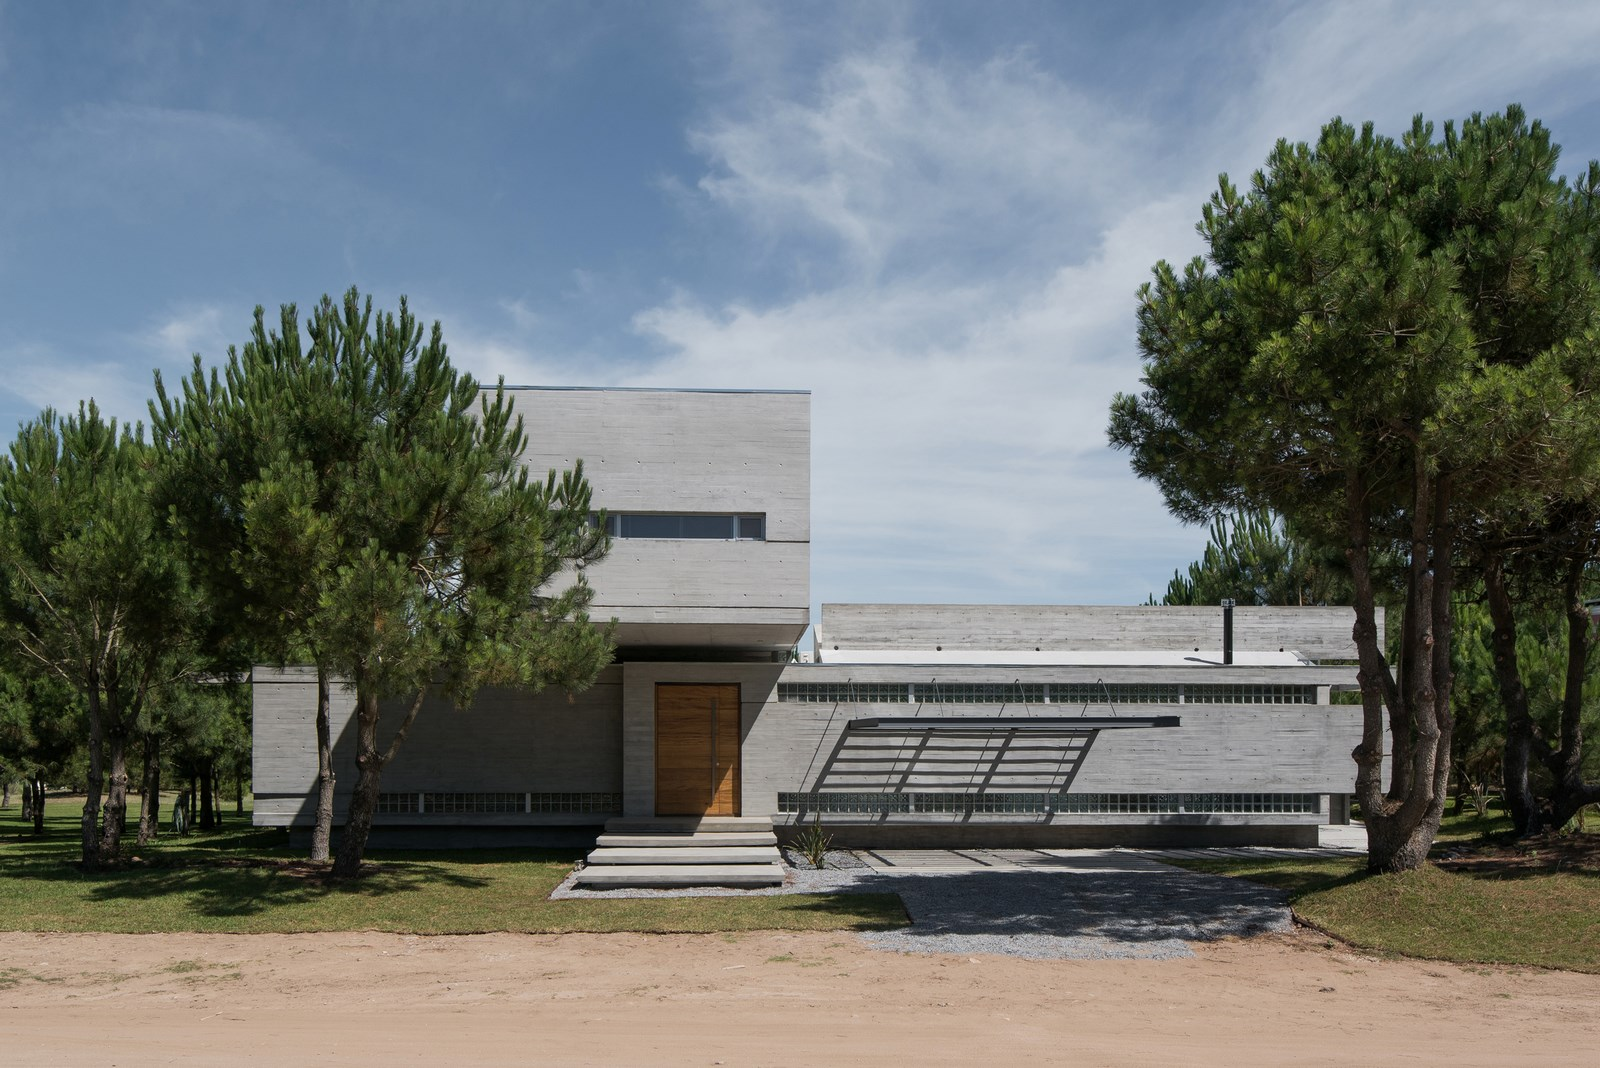 Casa AYYA - Estudio Galera - Foto © Diego Medina 002 (Copy)